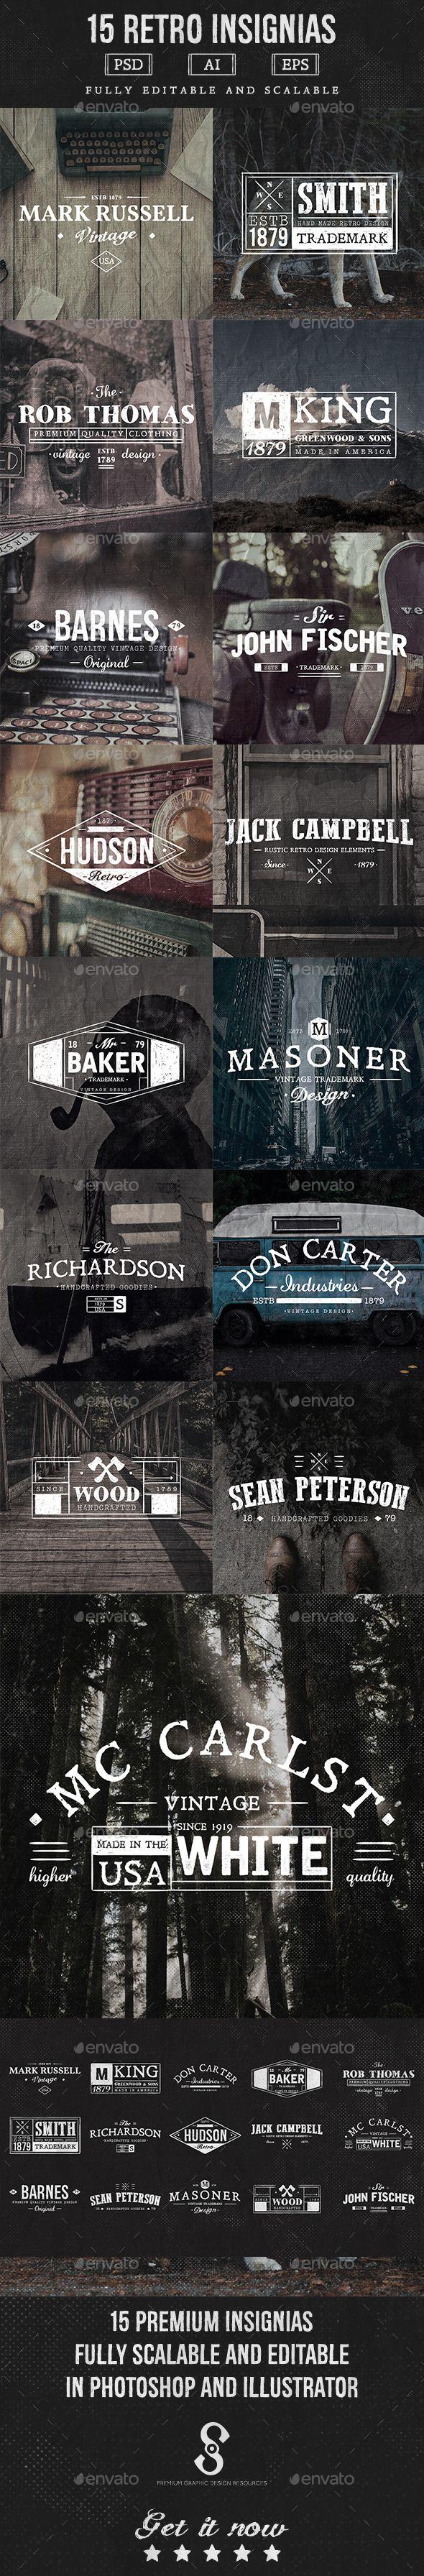 15 Vintage Insignias #design Download: http://graphicriver.net/item/15-vintage-insignias/11759286?ref=ksioks